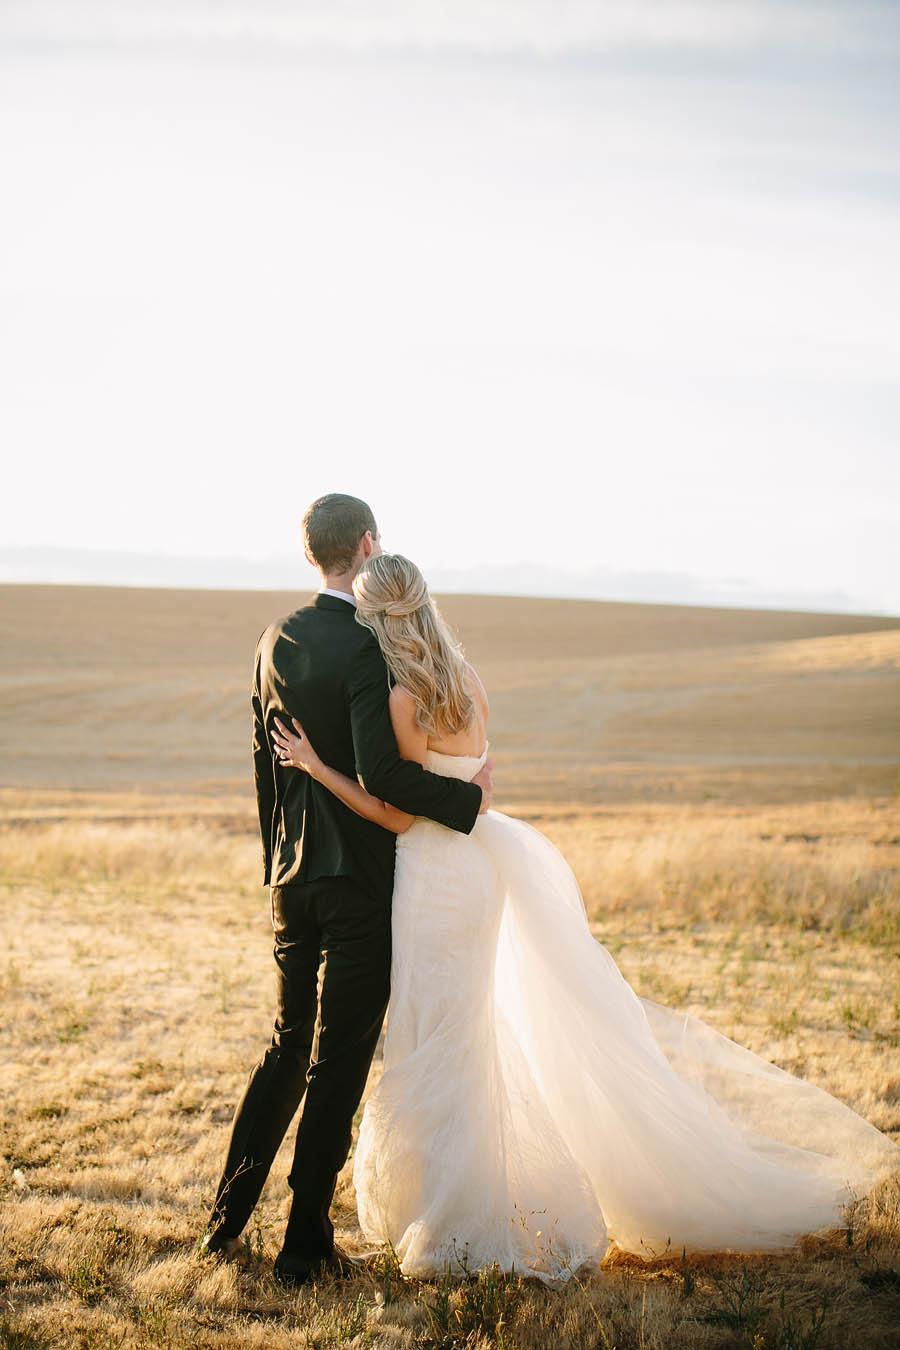 Areus_Wedding_KateandHans_093.JPG